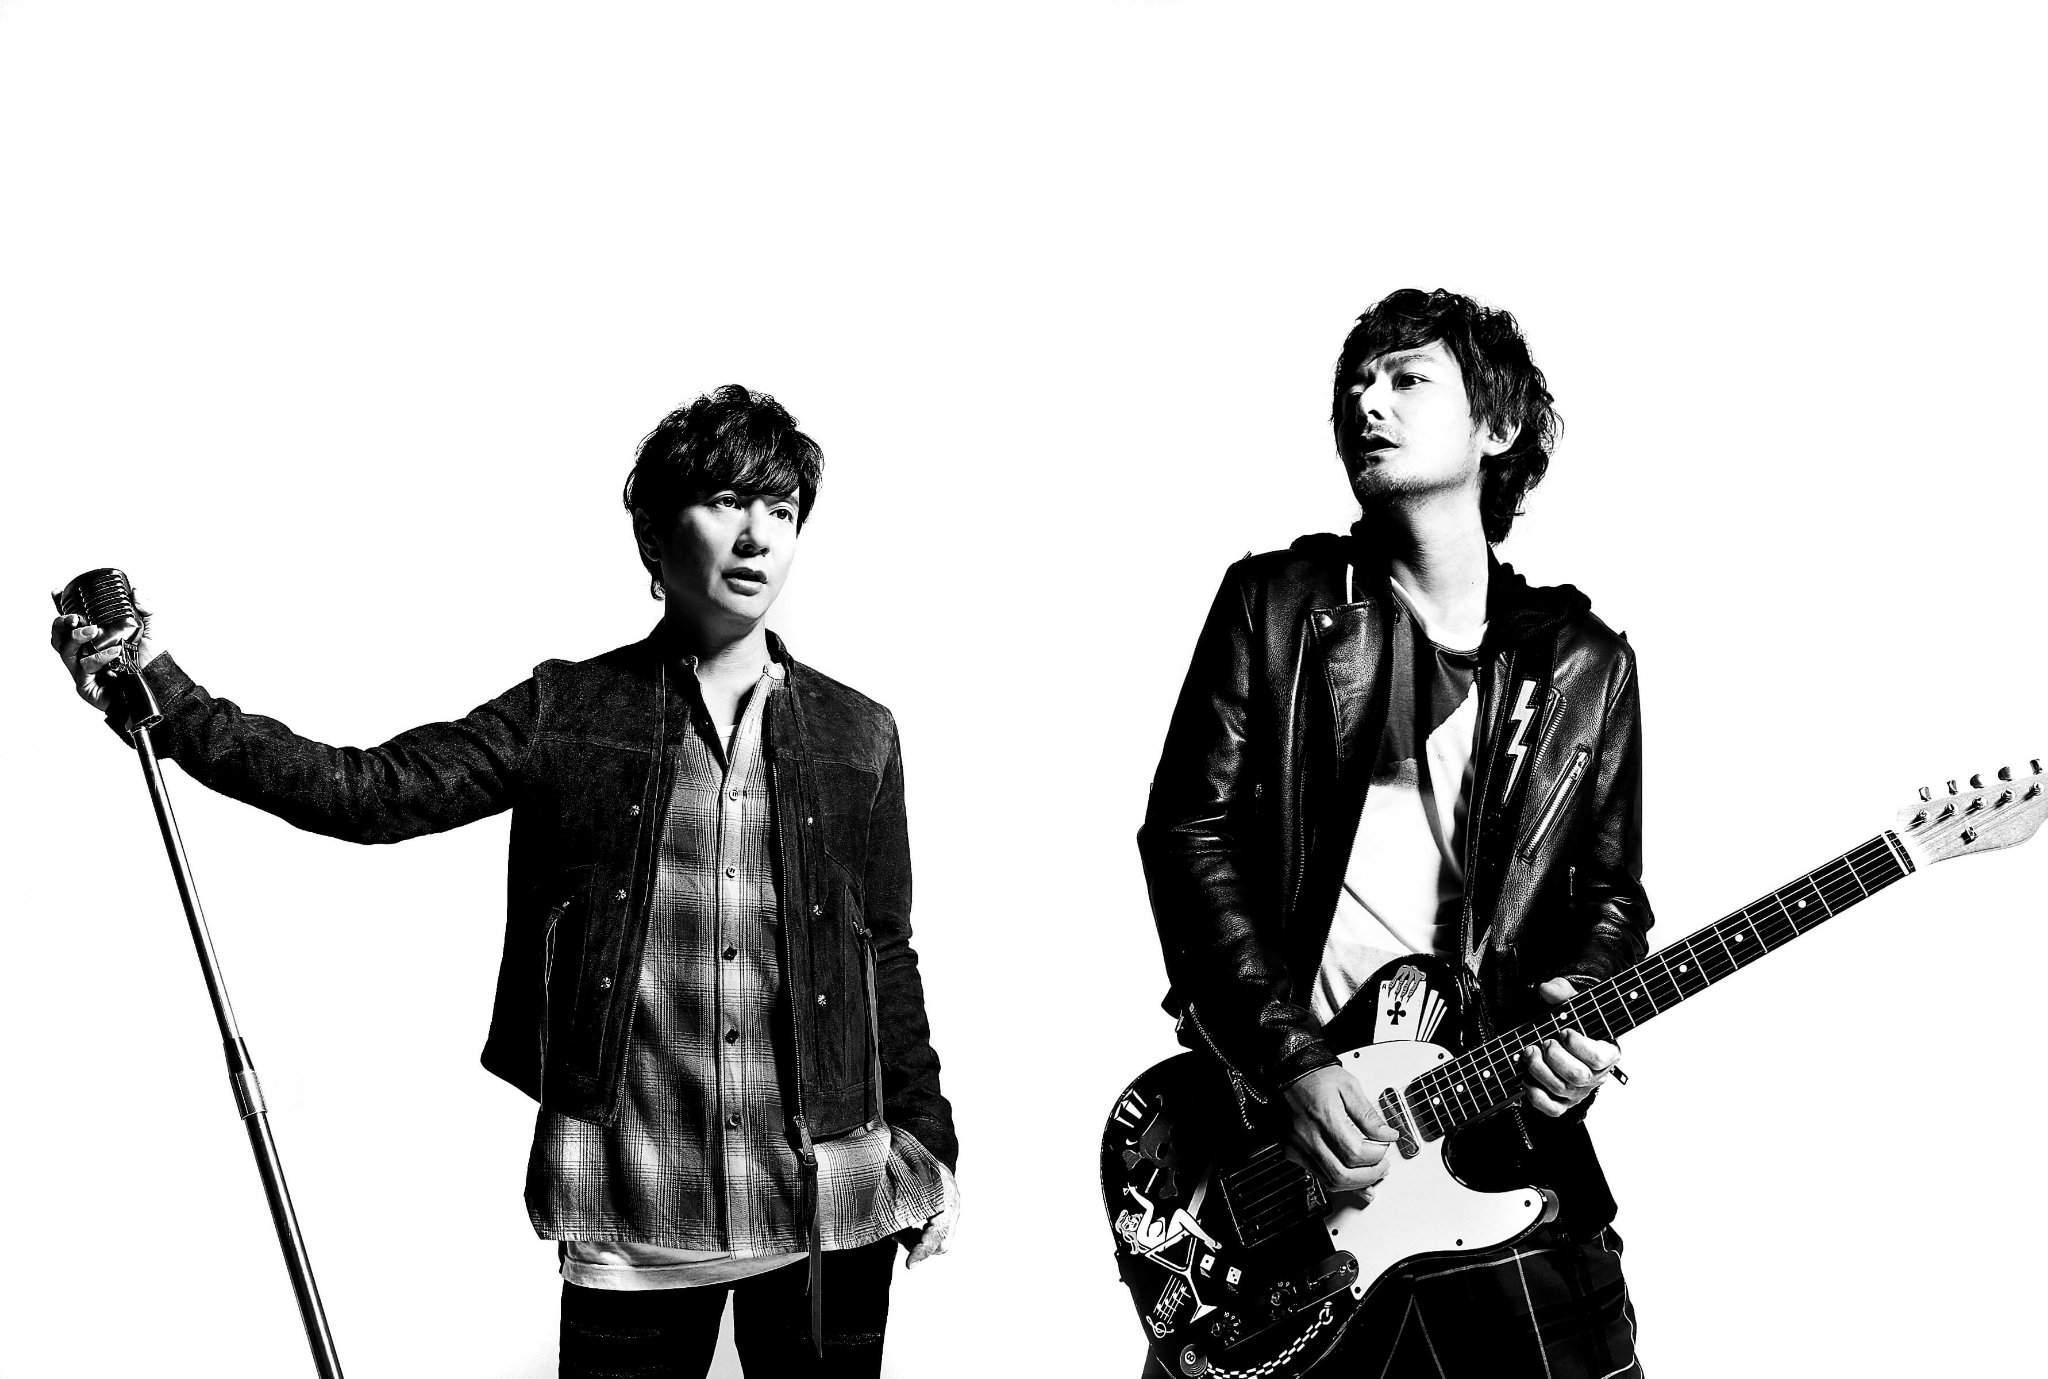 band giapponesi 4